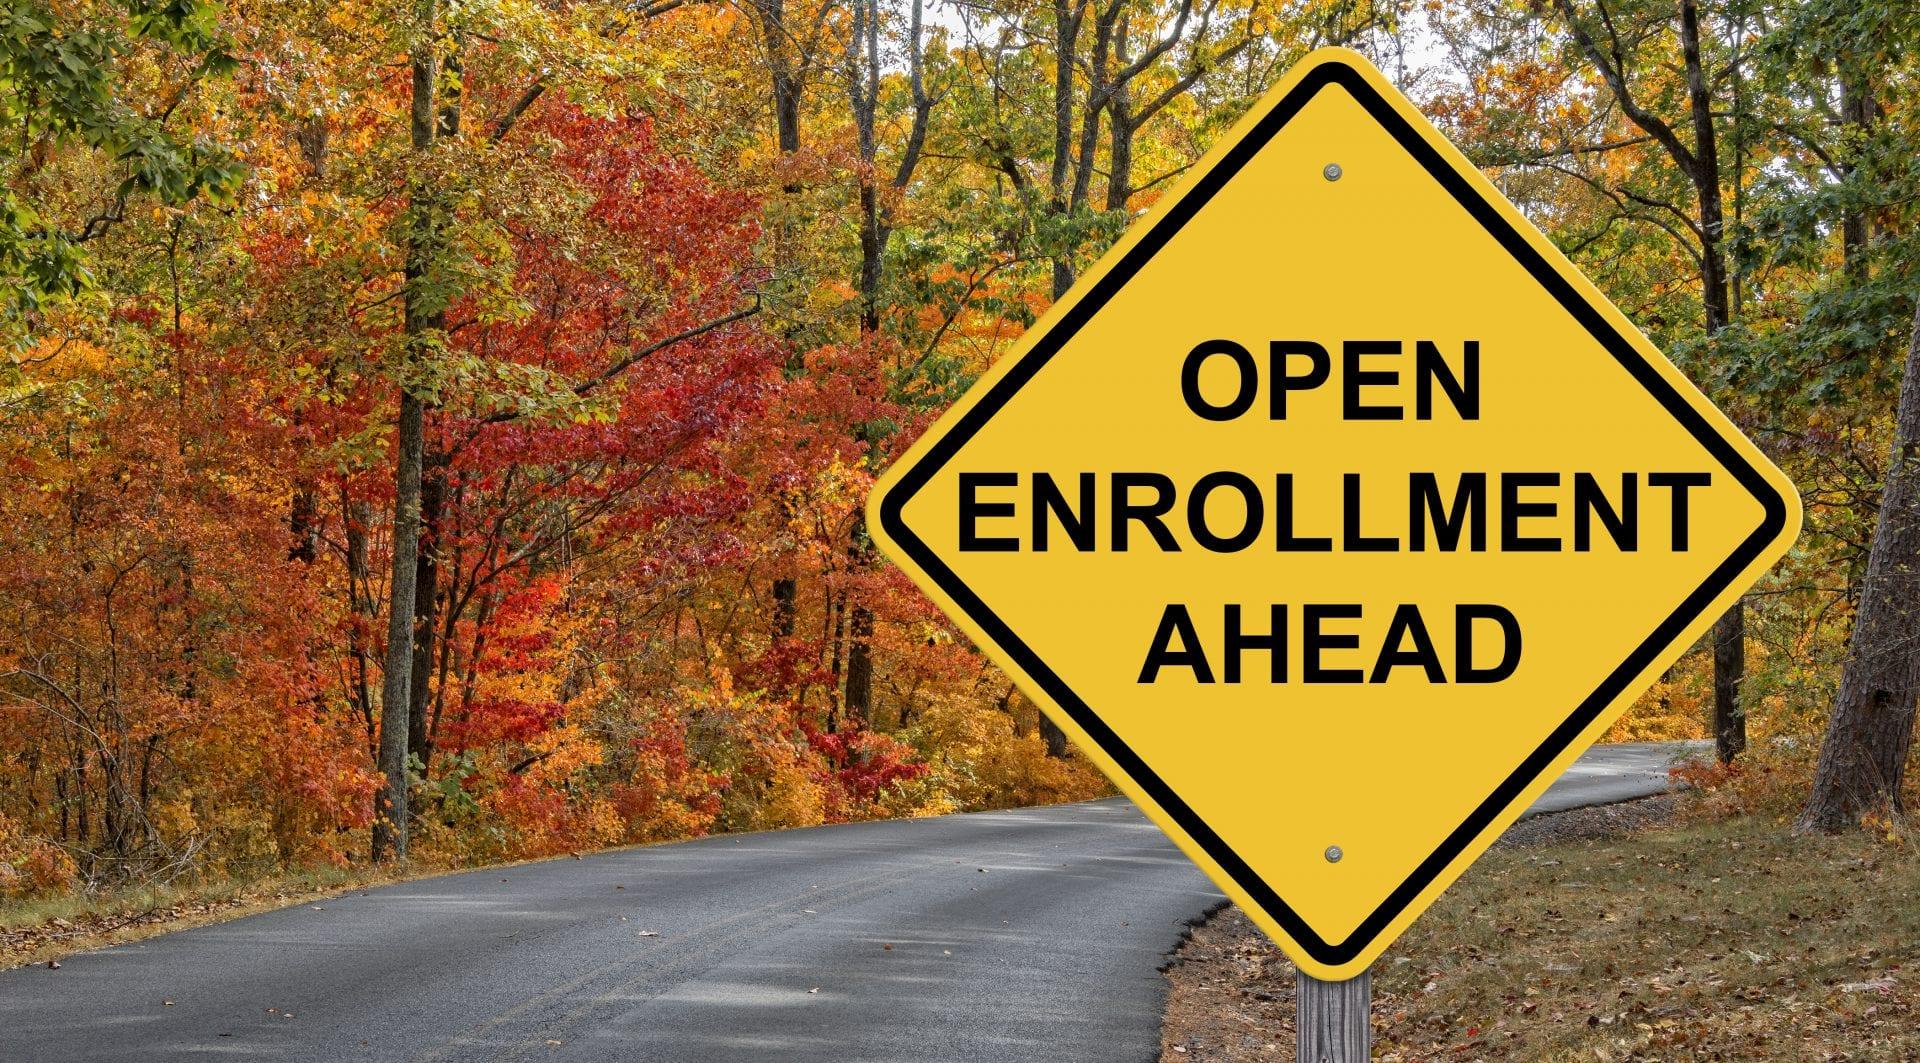 Ballast Advisors - Executive Benefits Planning, Open Enrollment